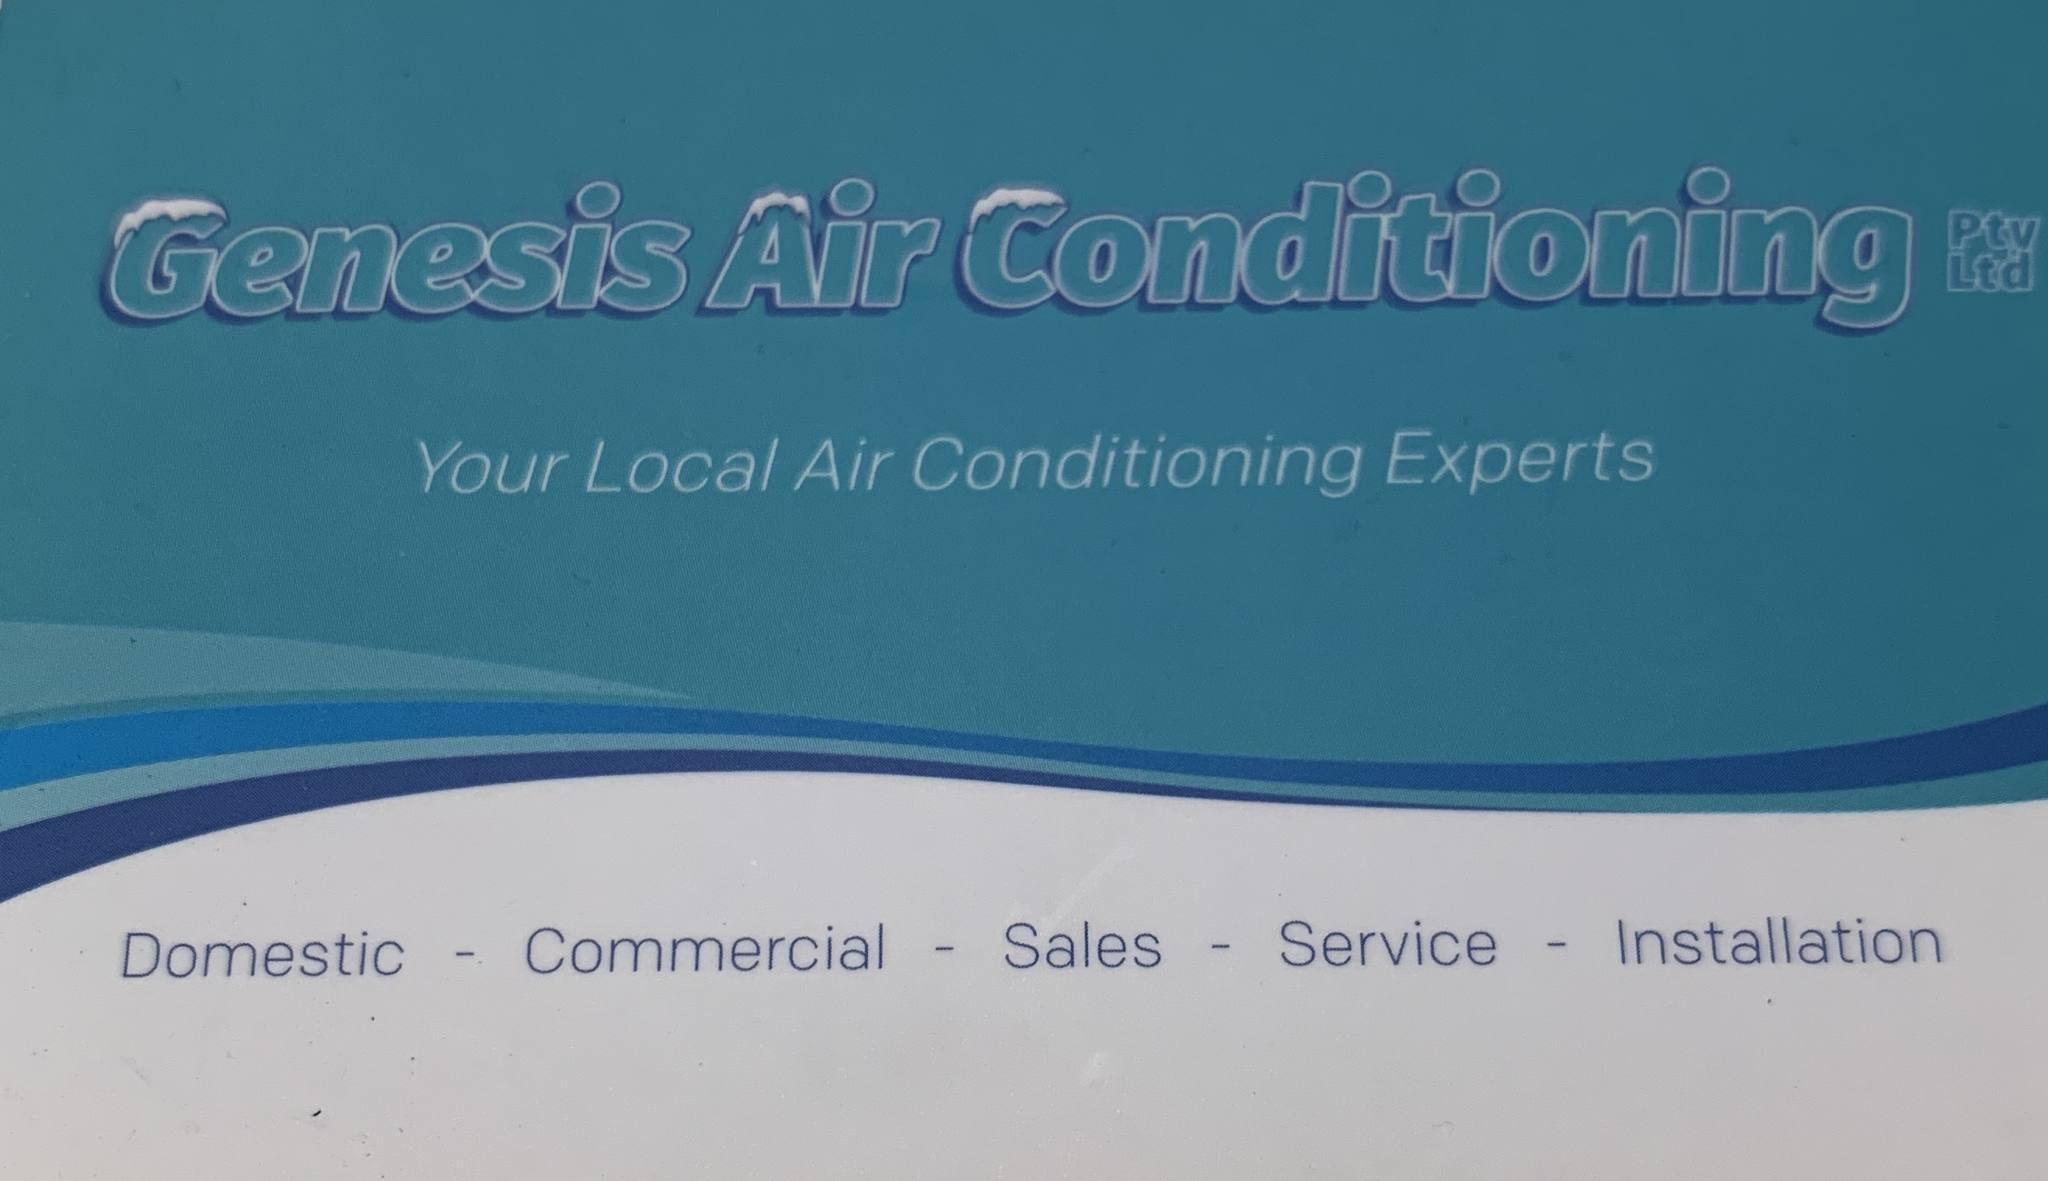 Genesis Air Conditioning